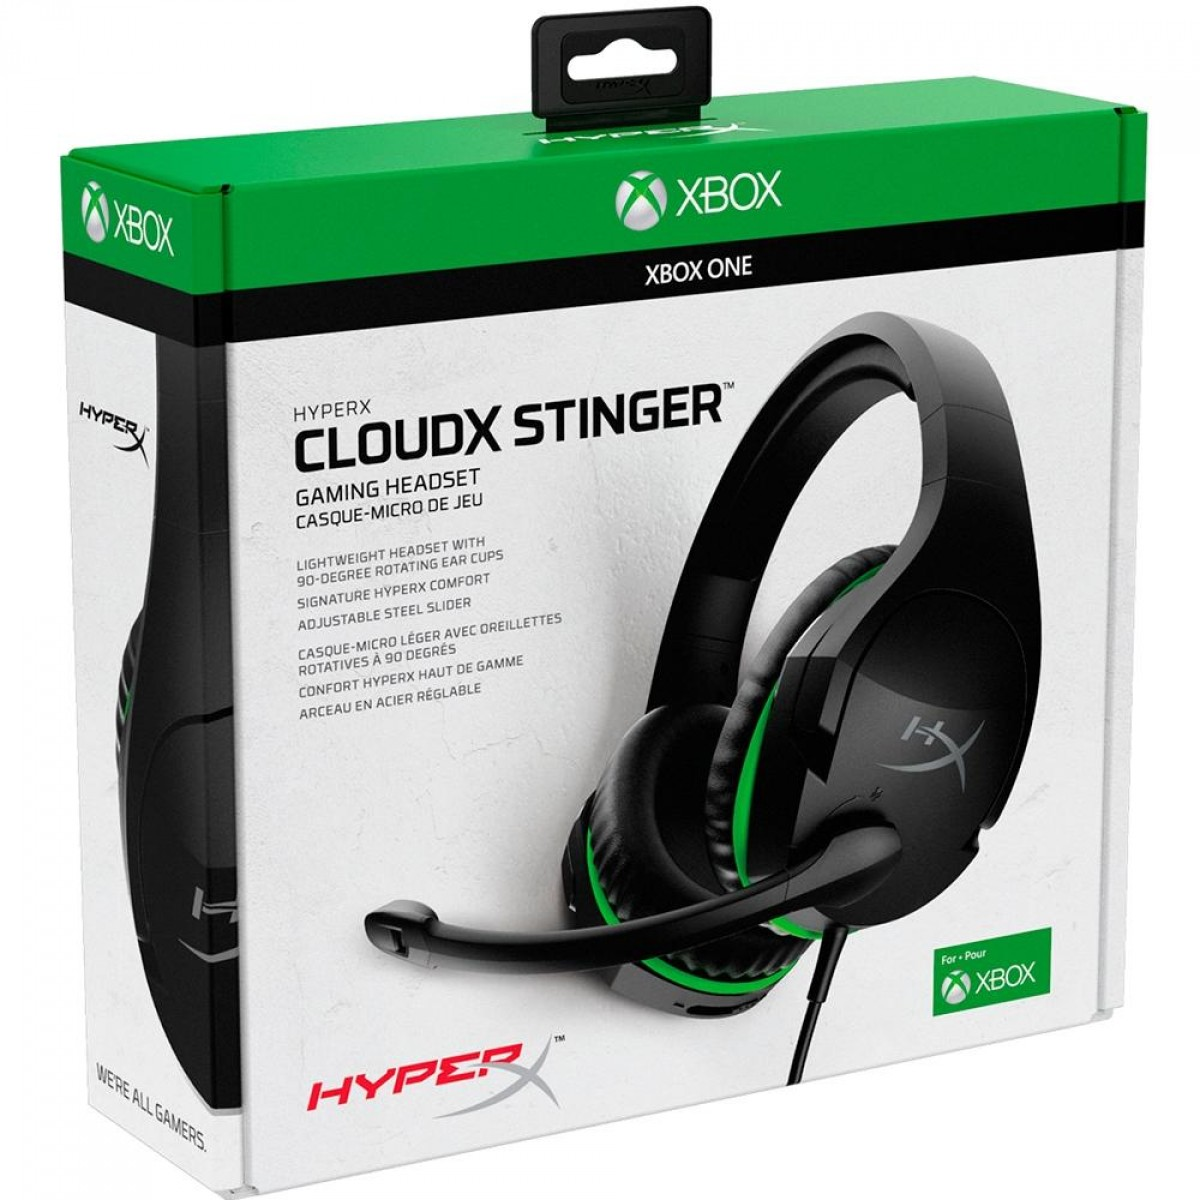 Headset Gamer HyperX CloudX Stinger Xbox, 3.5mm, Black/Green, HX-HSCSX-BK/WW